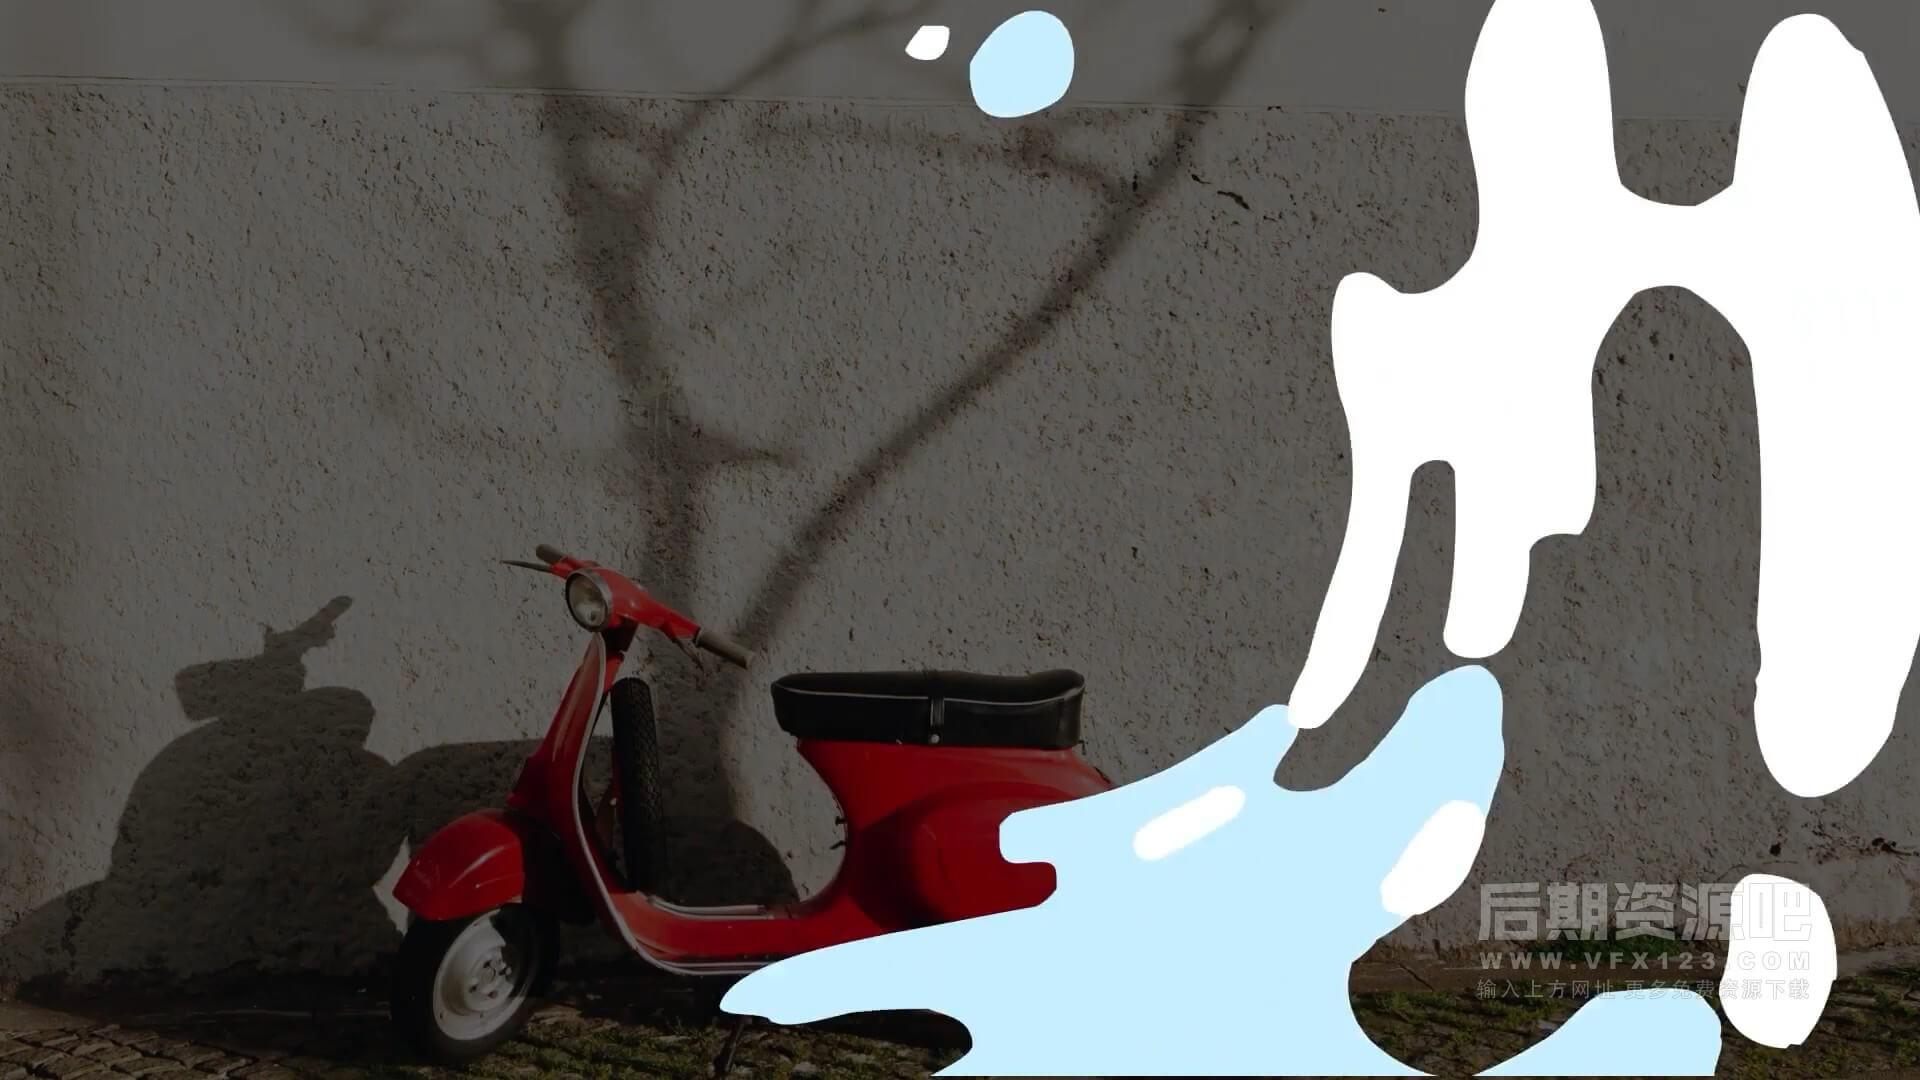 fcpx插件 卡通水主题标题转场动画模板 Cartoon Liquid Titles